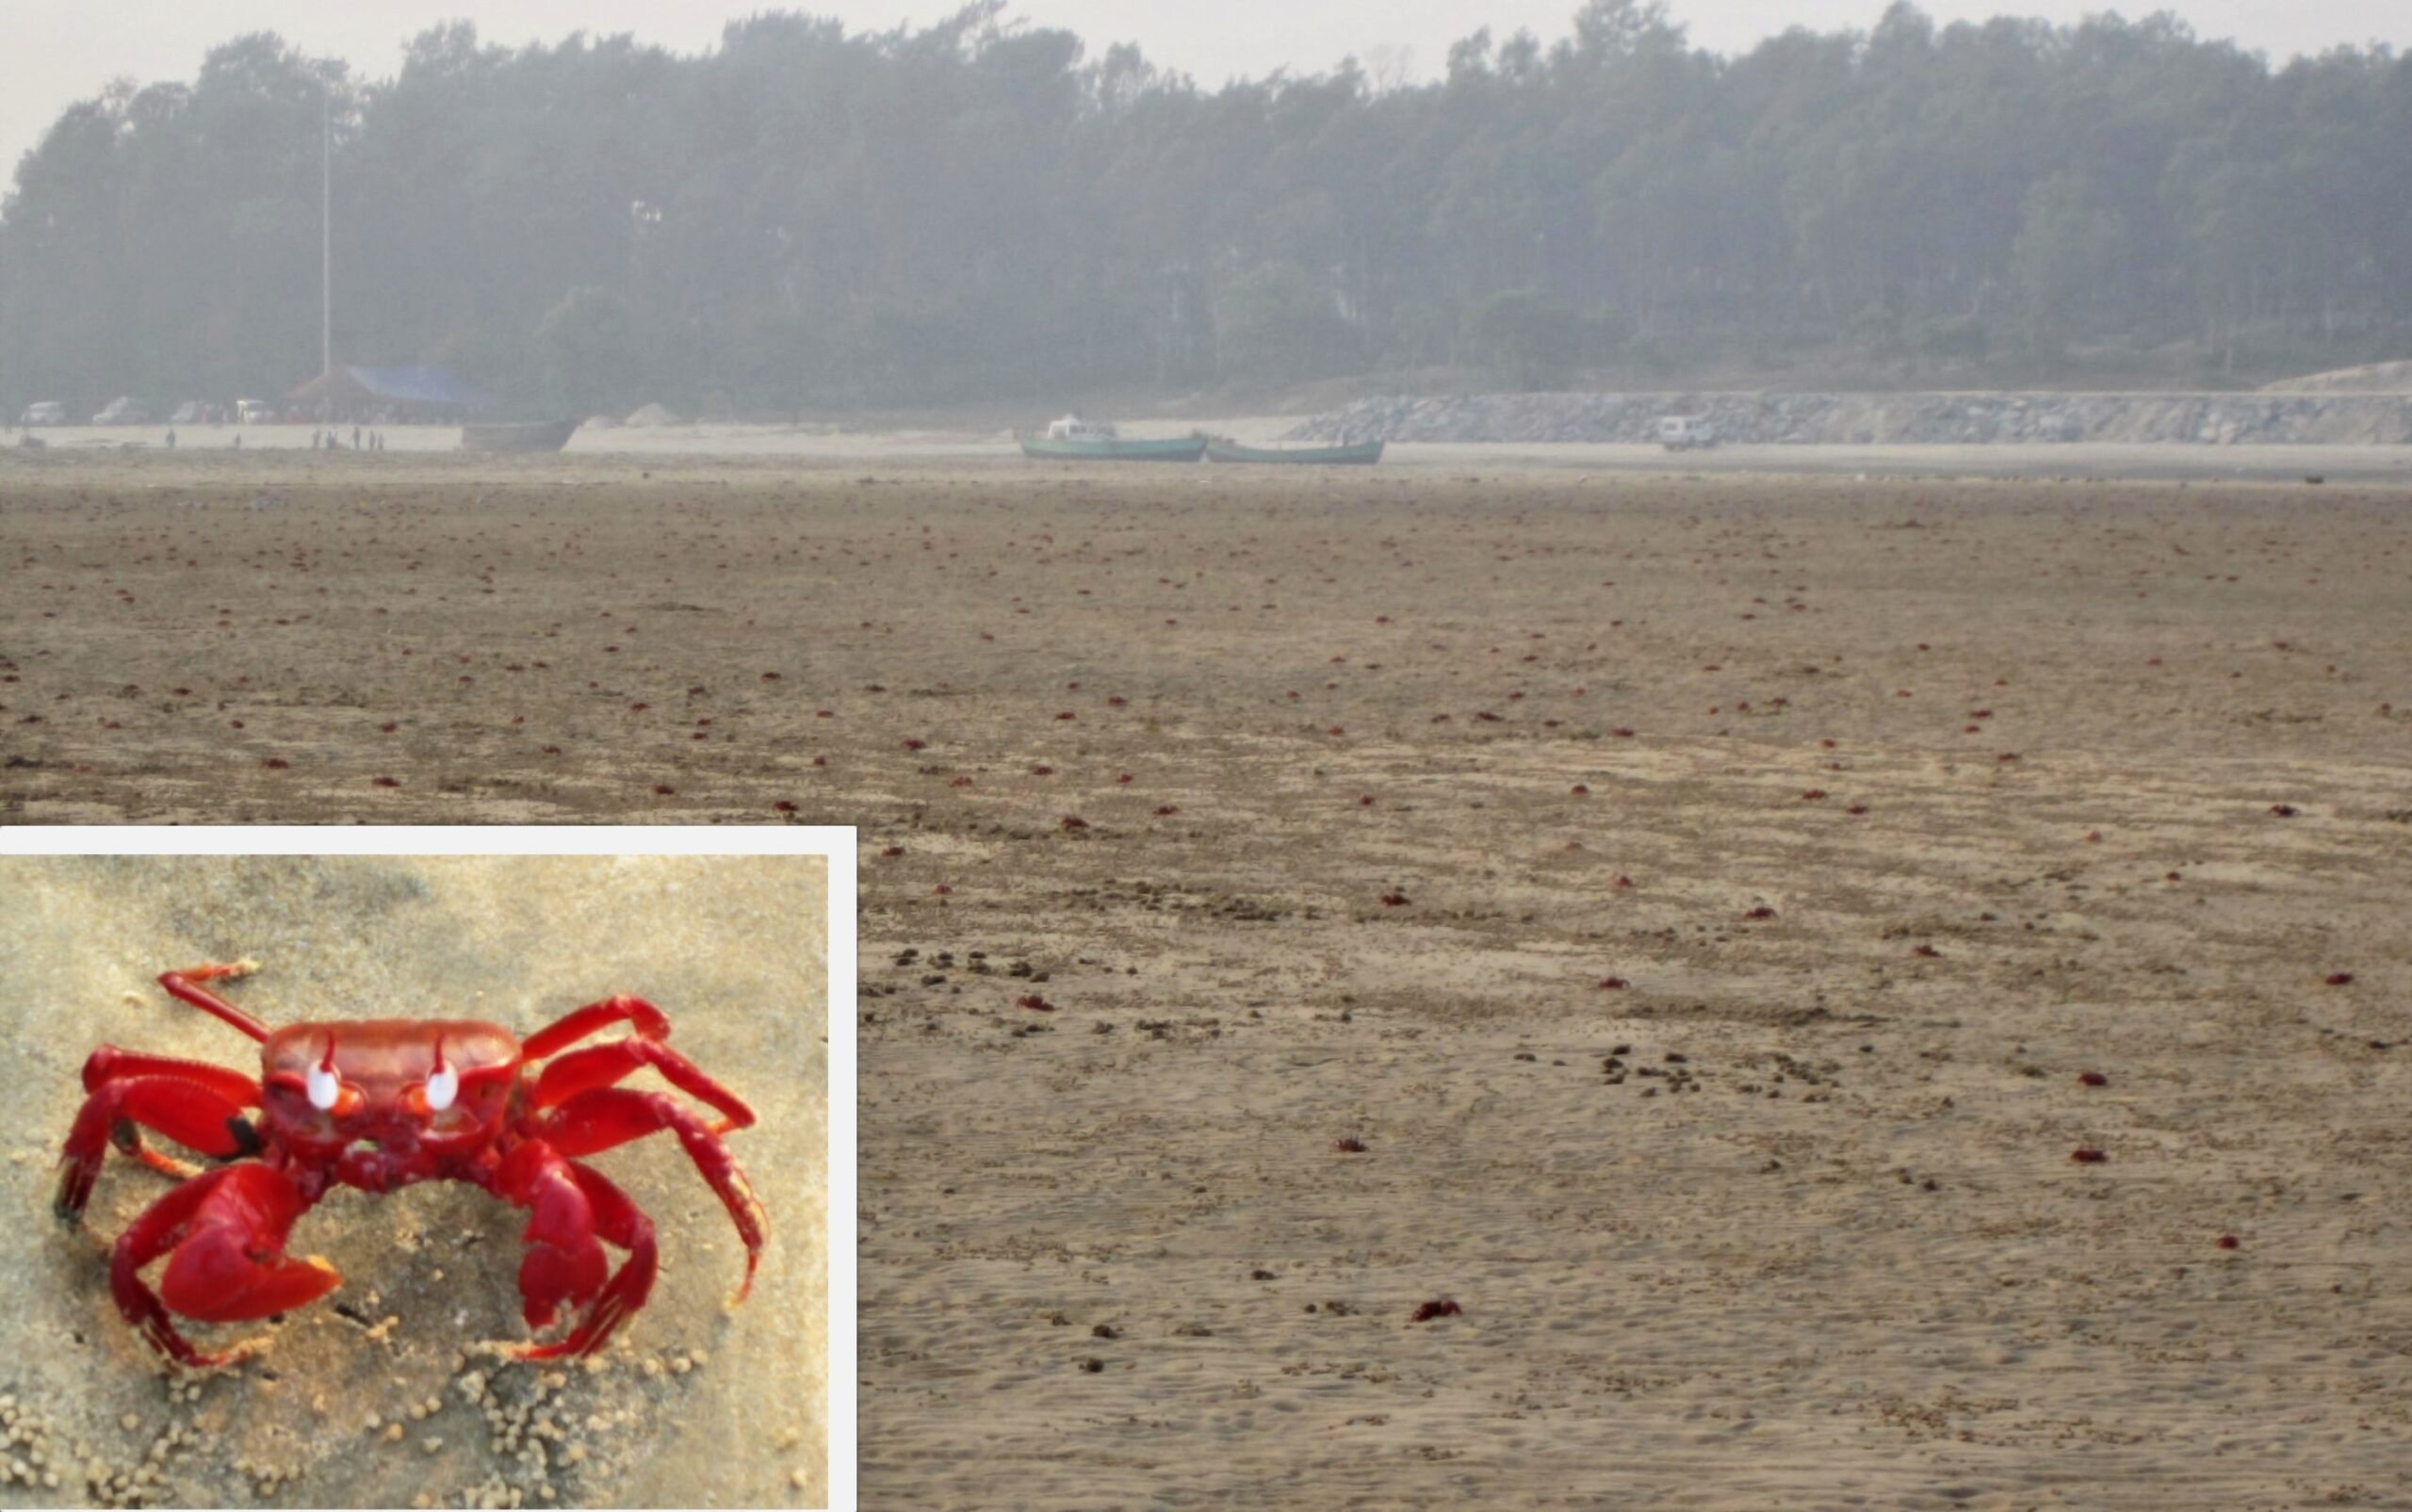 Red Crabs at Talsari Beach